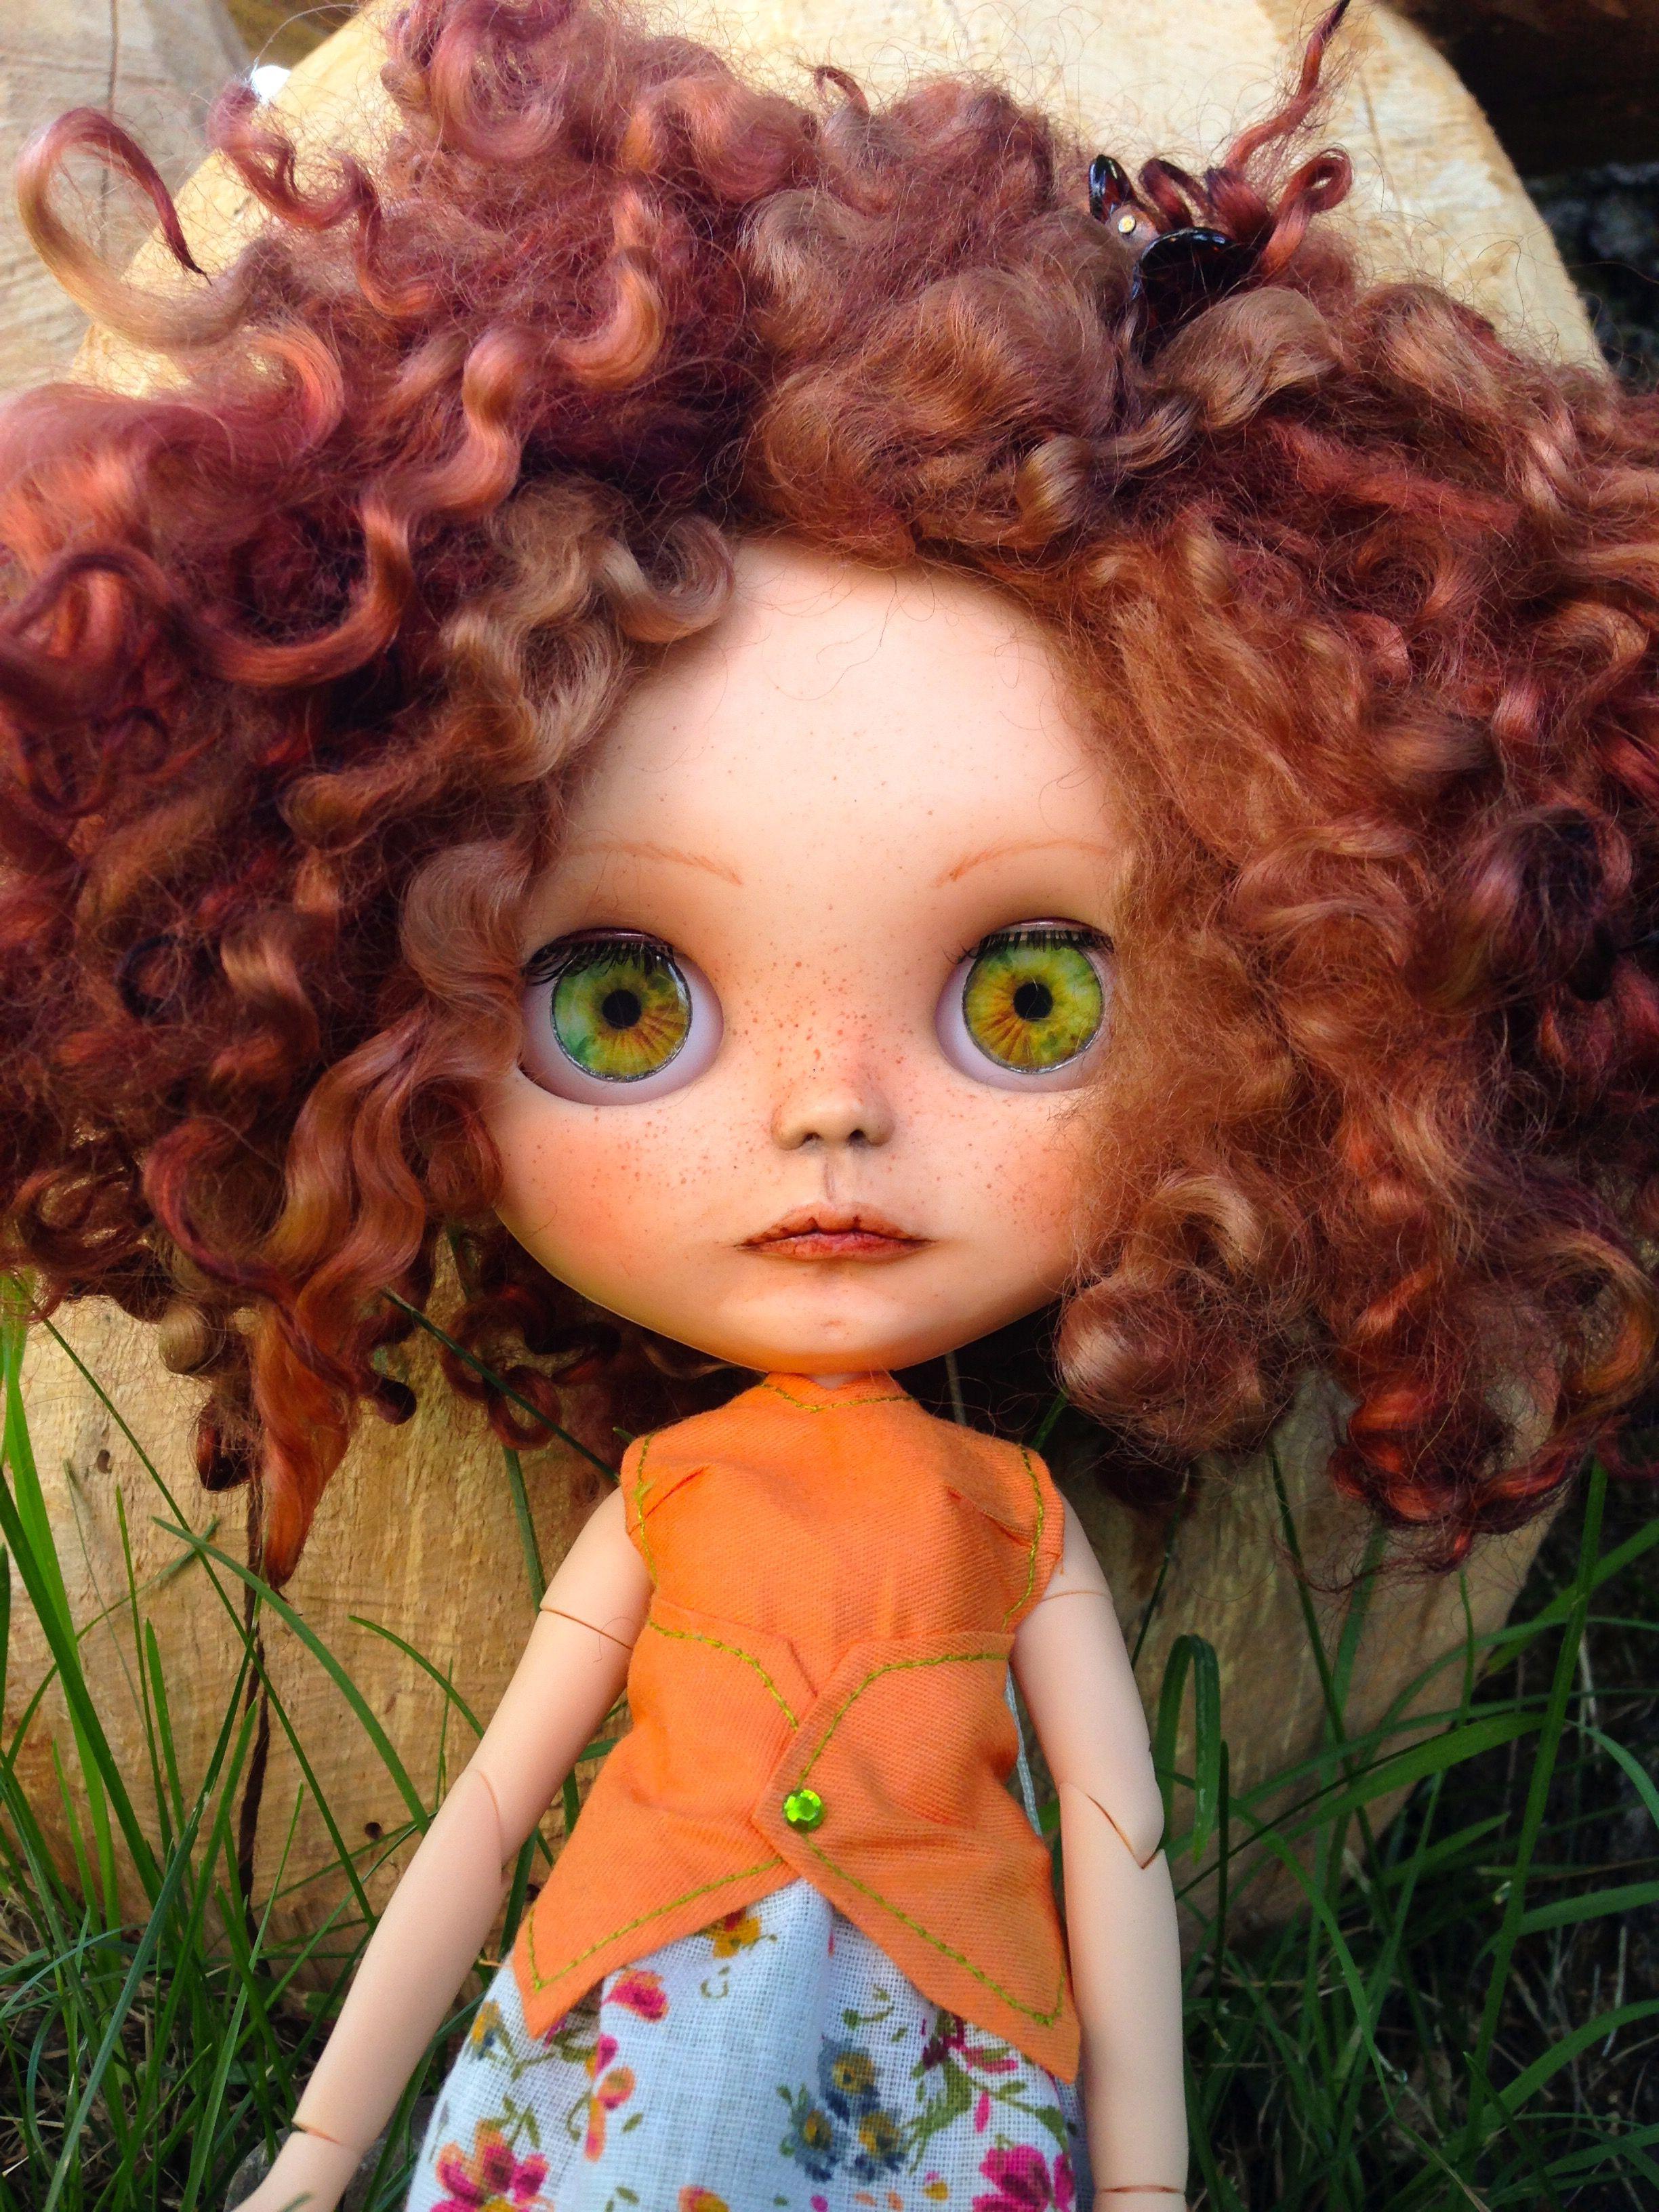 Blythe doll by vanessa blythe dolls kawaii doll cute dolls